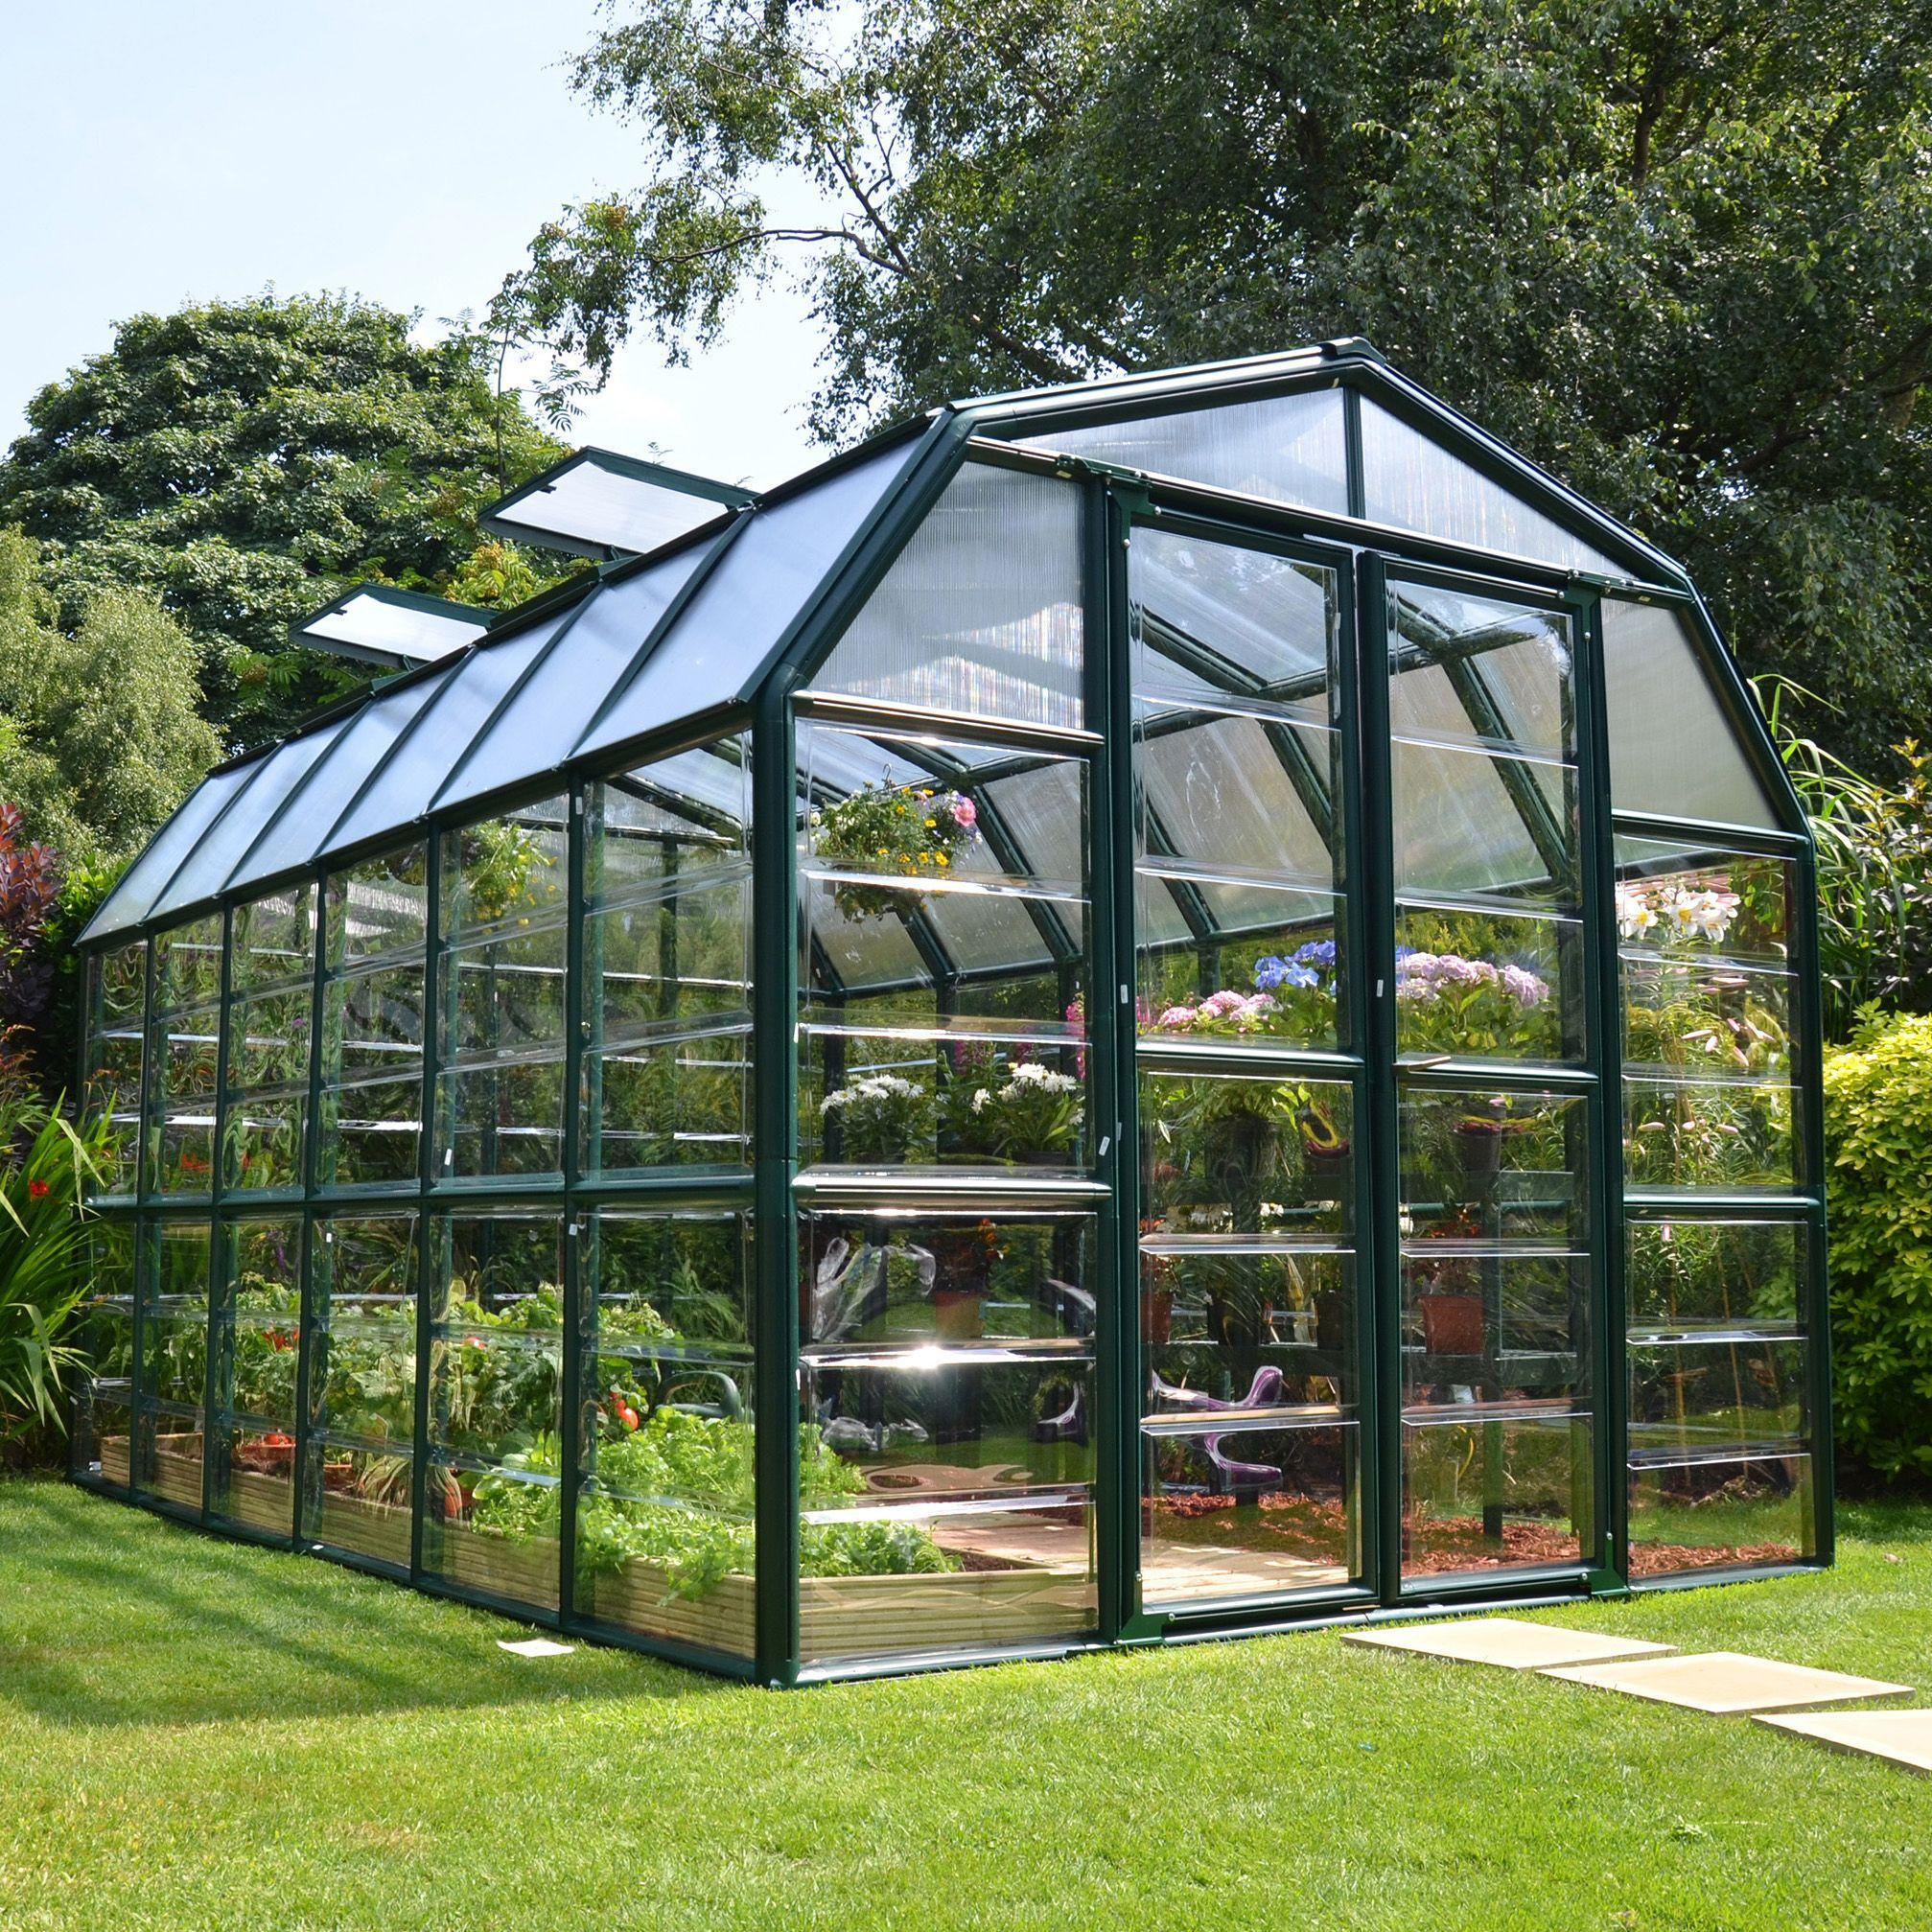 Rion Grand Gardner 8x12 Acrylic Glass Greenhouse